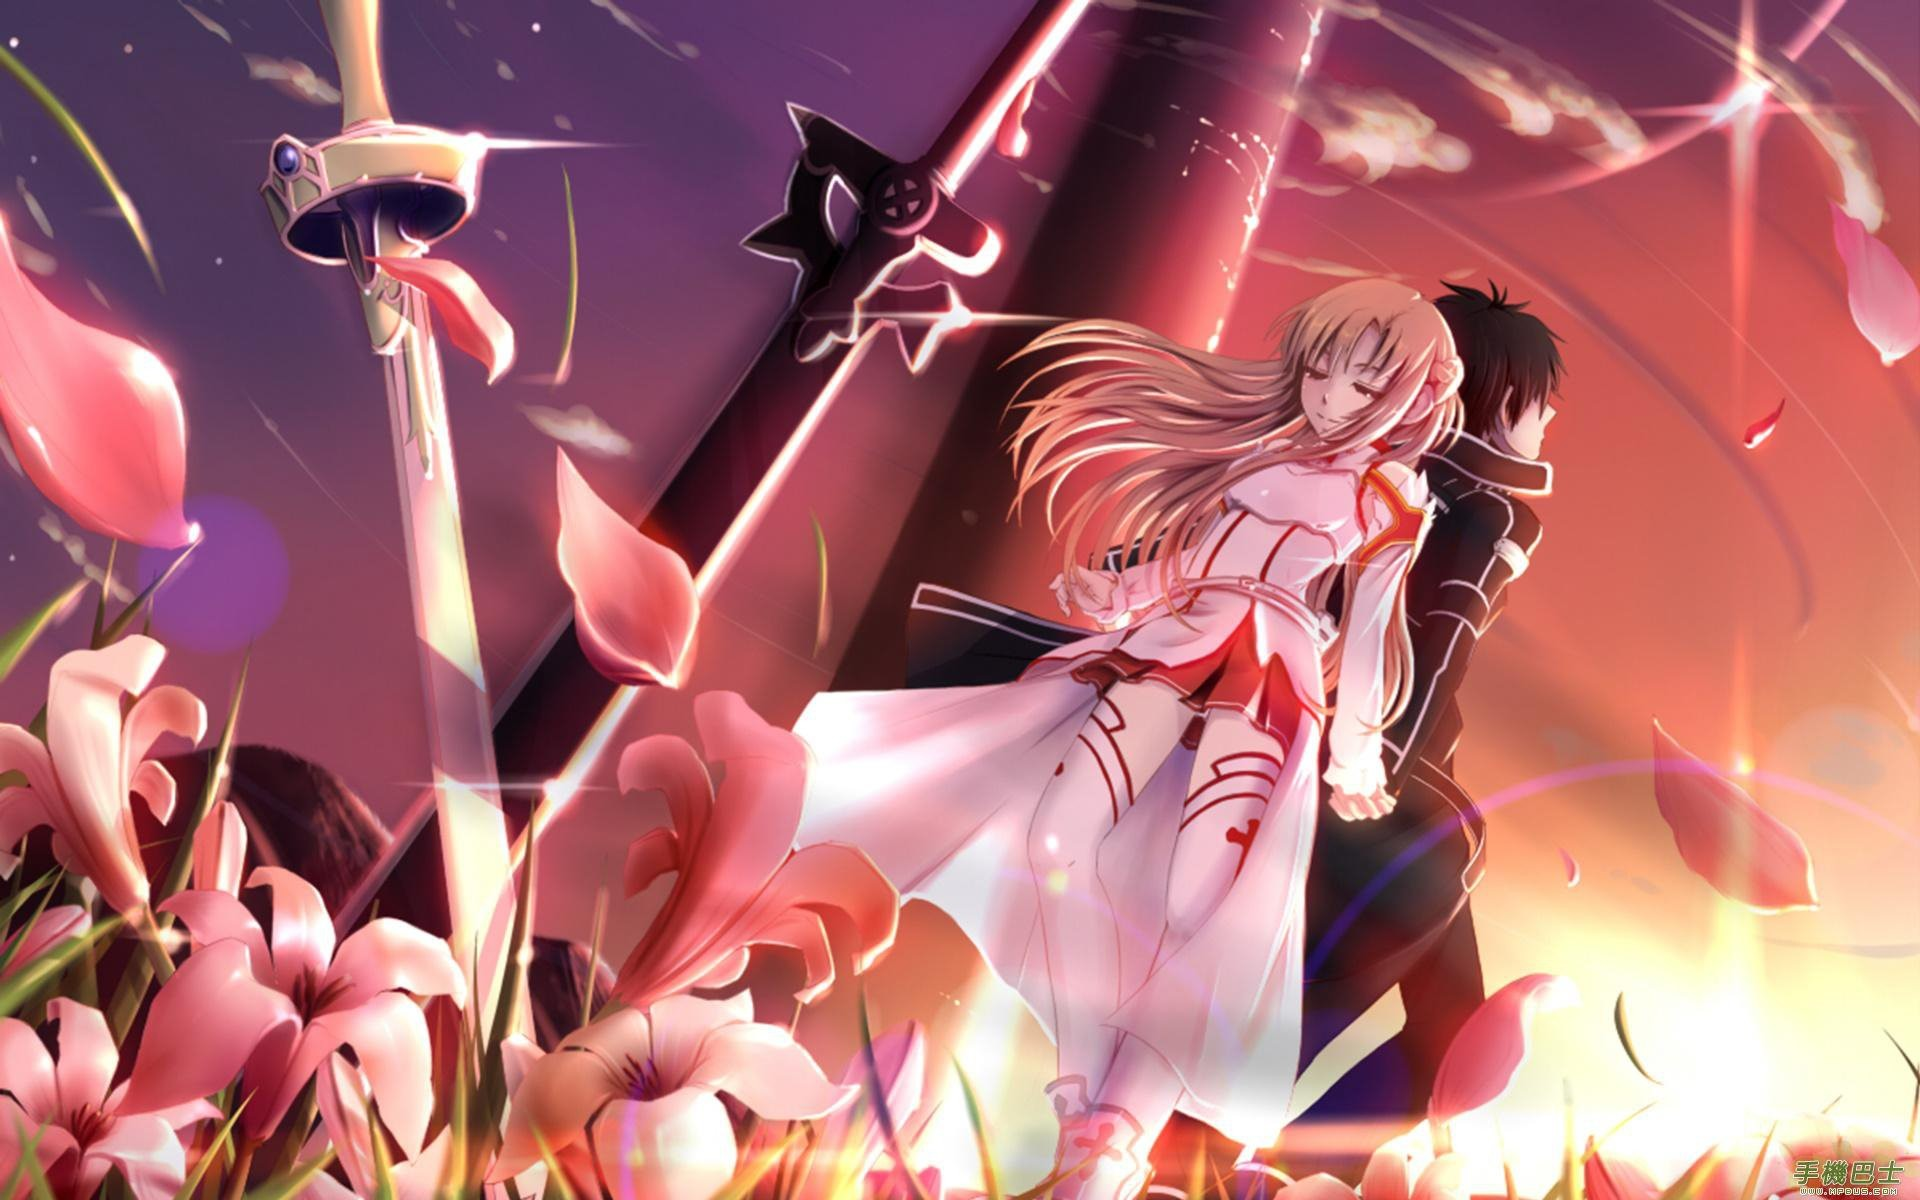 10 Top Kirito And Asuna Wallpaper FULL HD 1080p For PC